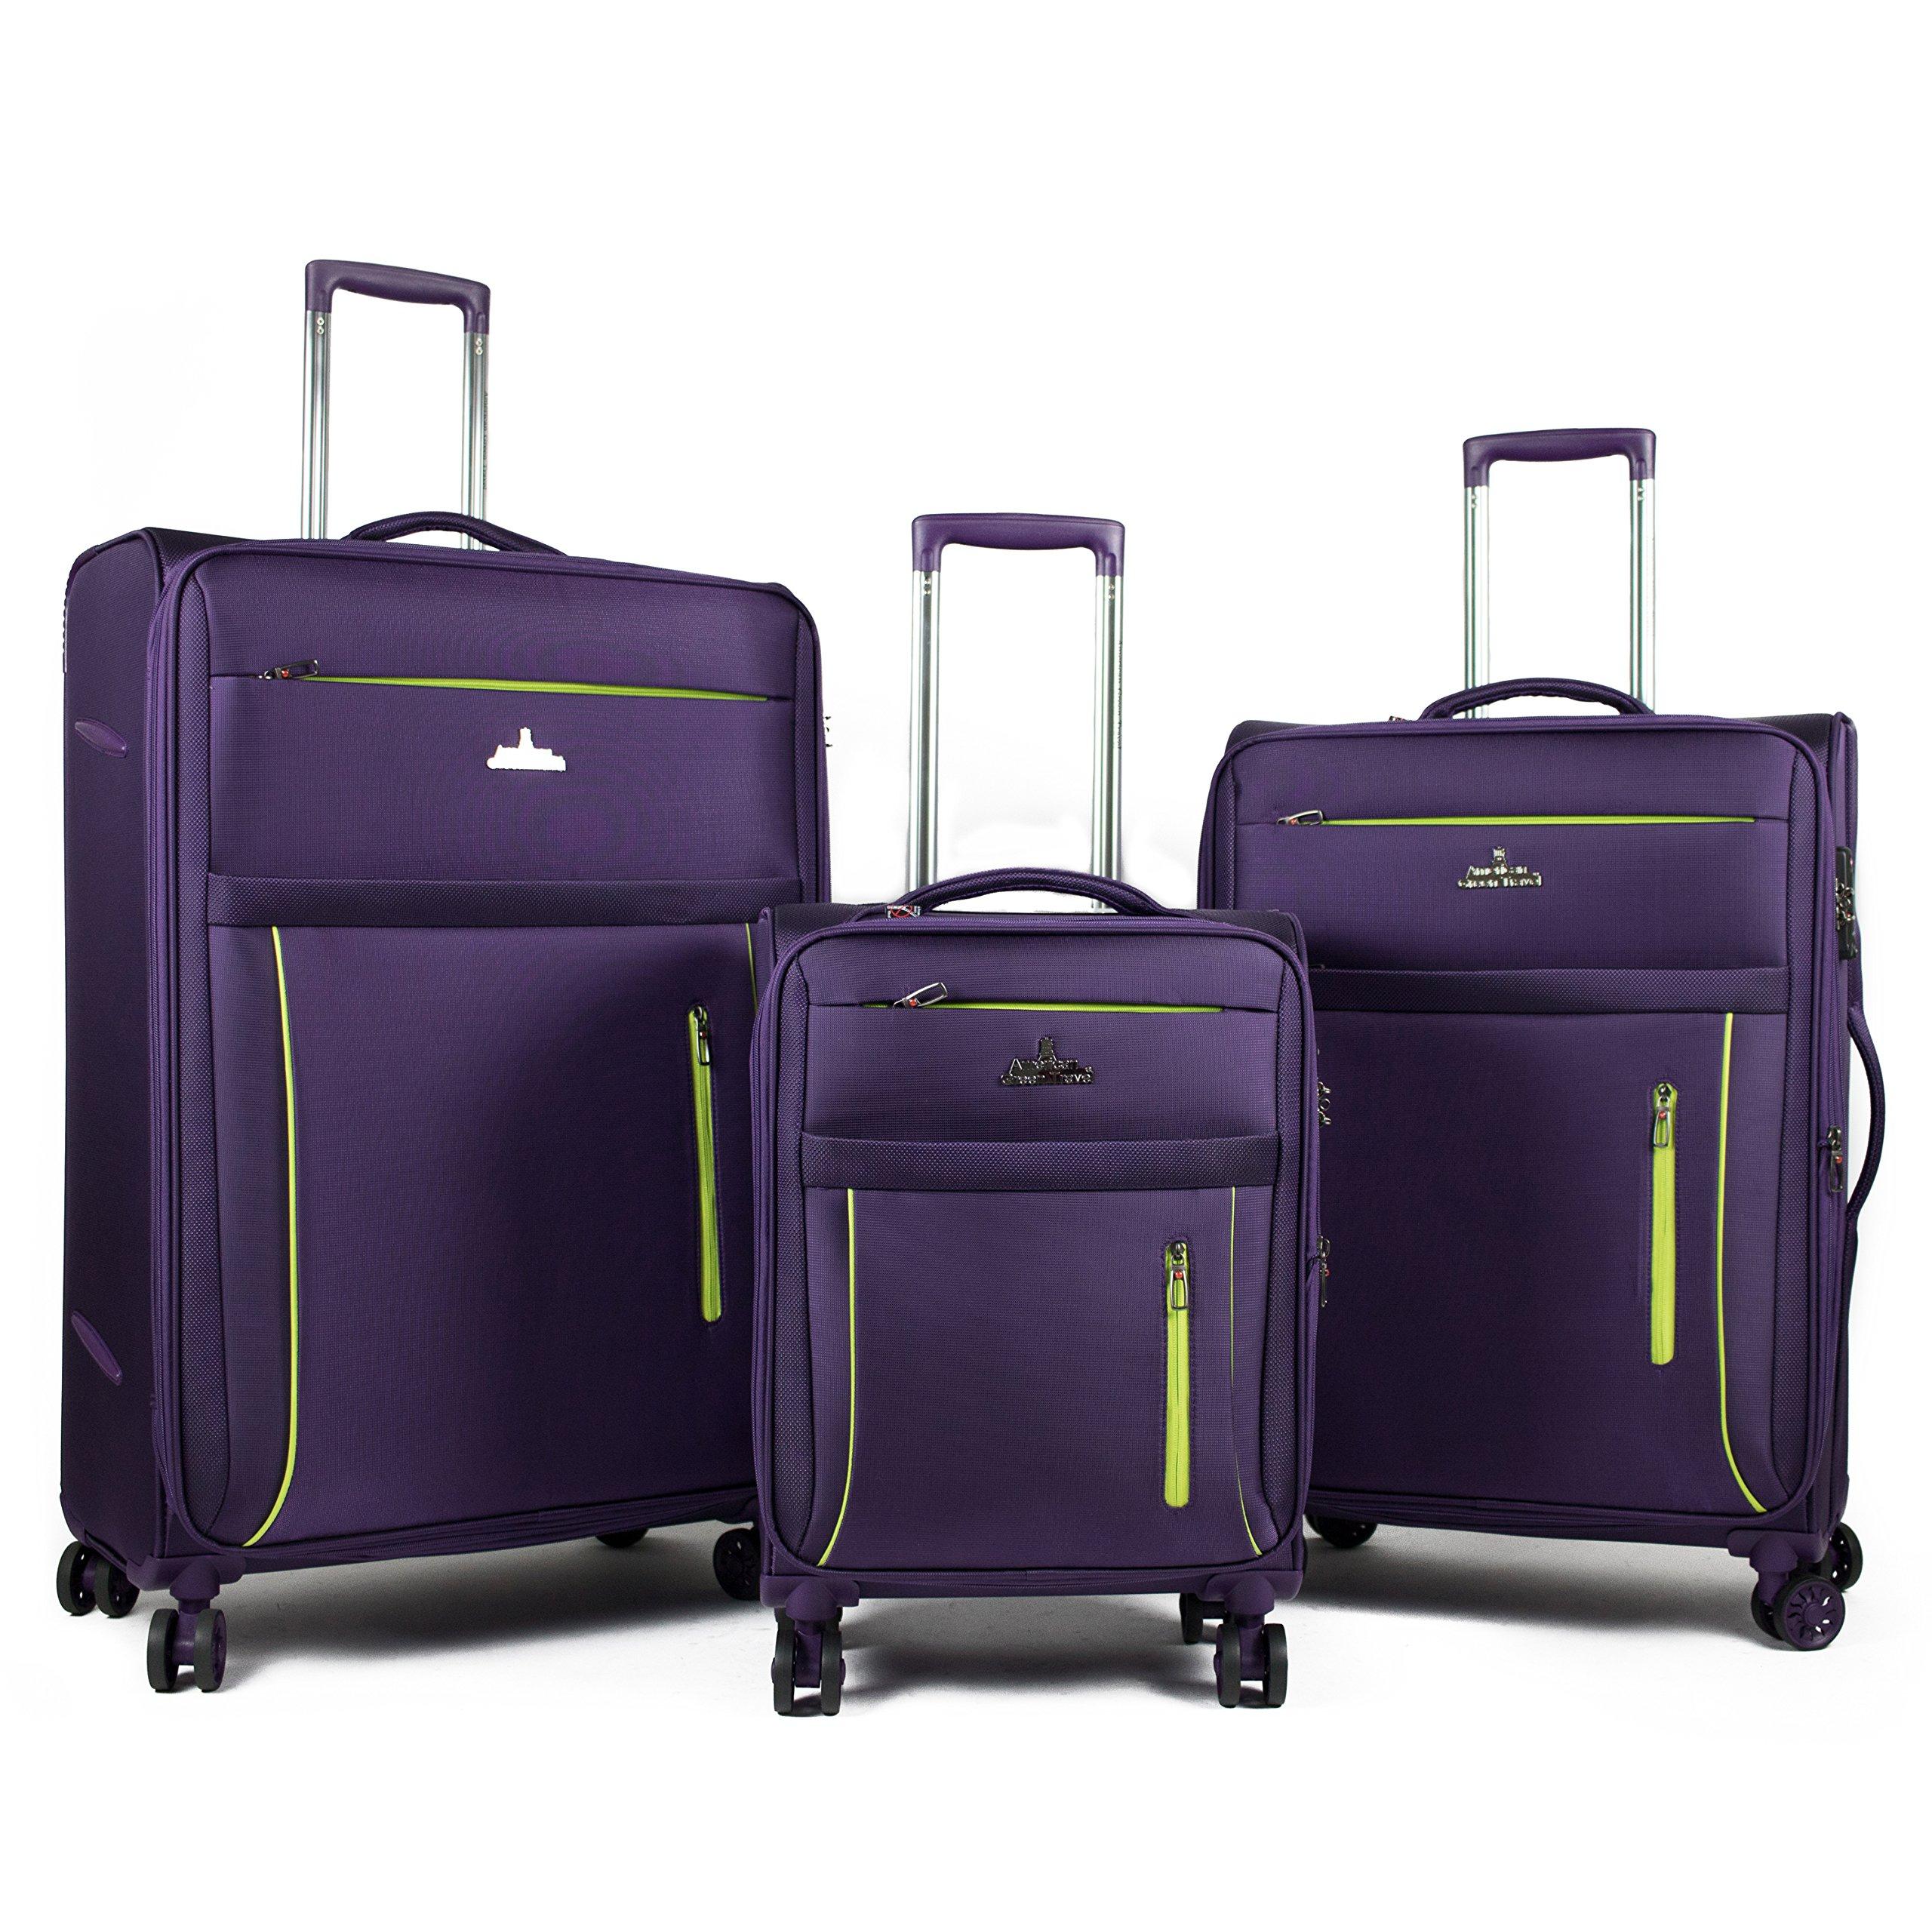 American Green Travel Soteria Anti-theft Lightweight 3-Piece Luggage Set (Purple)